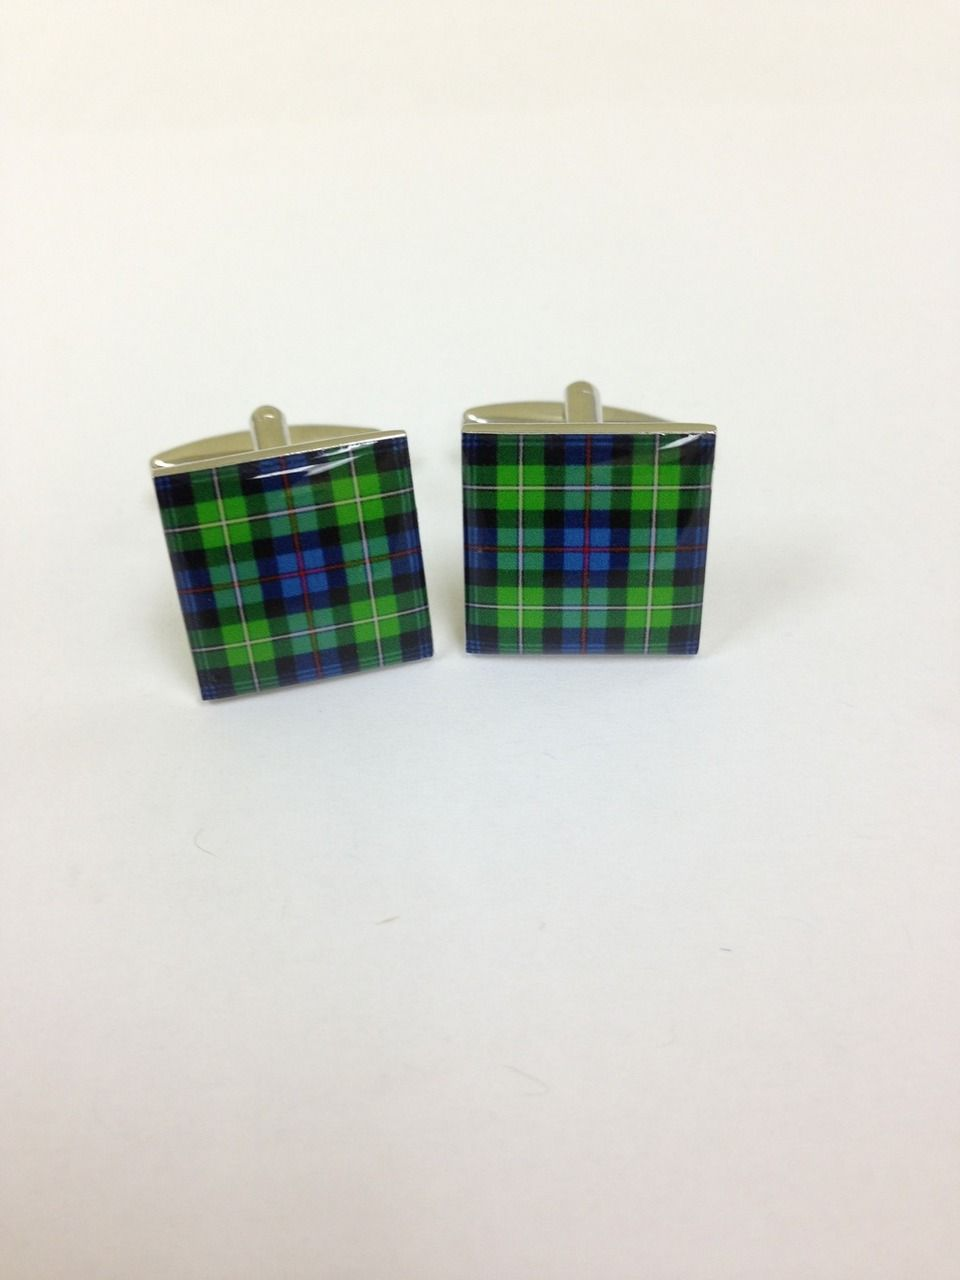 2 Pc. Green/Blue Plaid Fashion Design Cufflinks